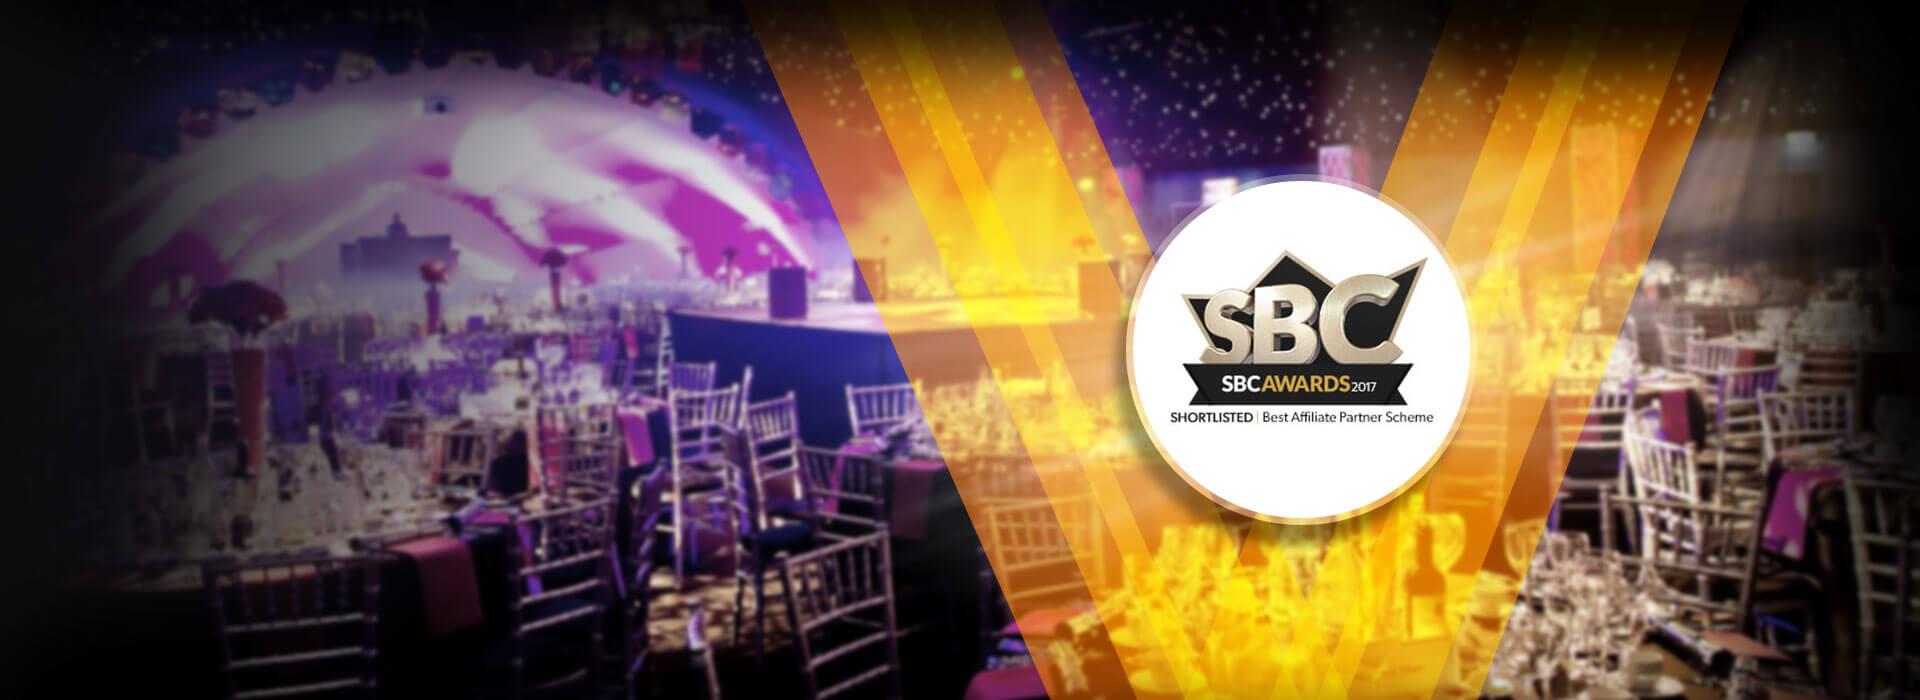 EnergyPartners Shortlisted for SBC Awards 2017